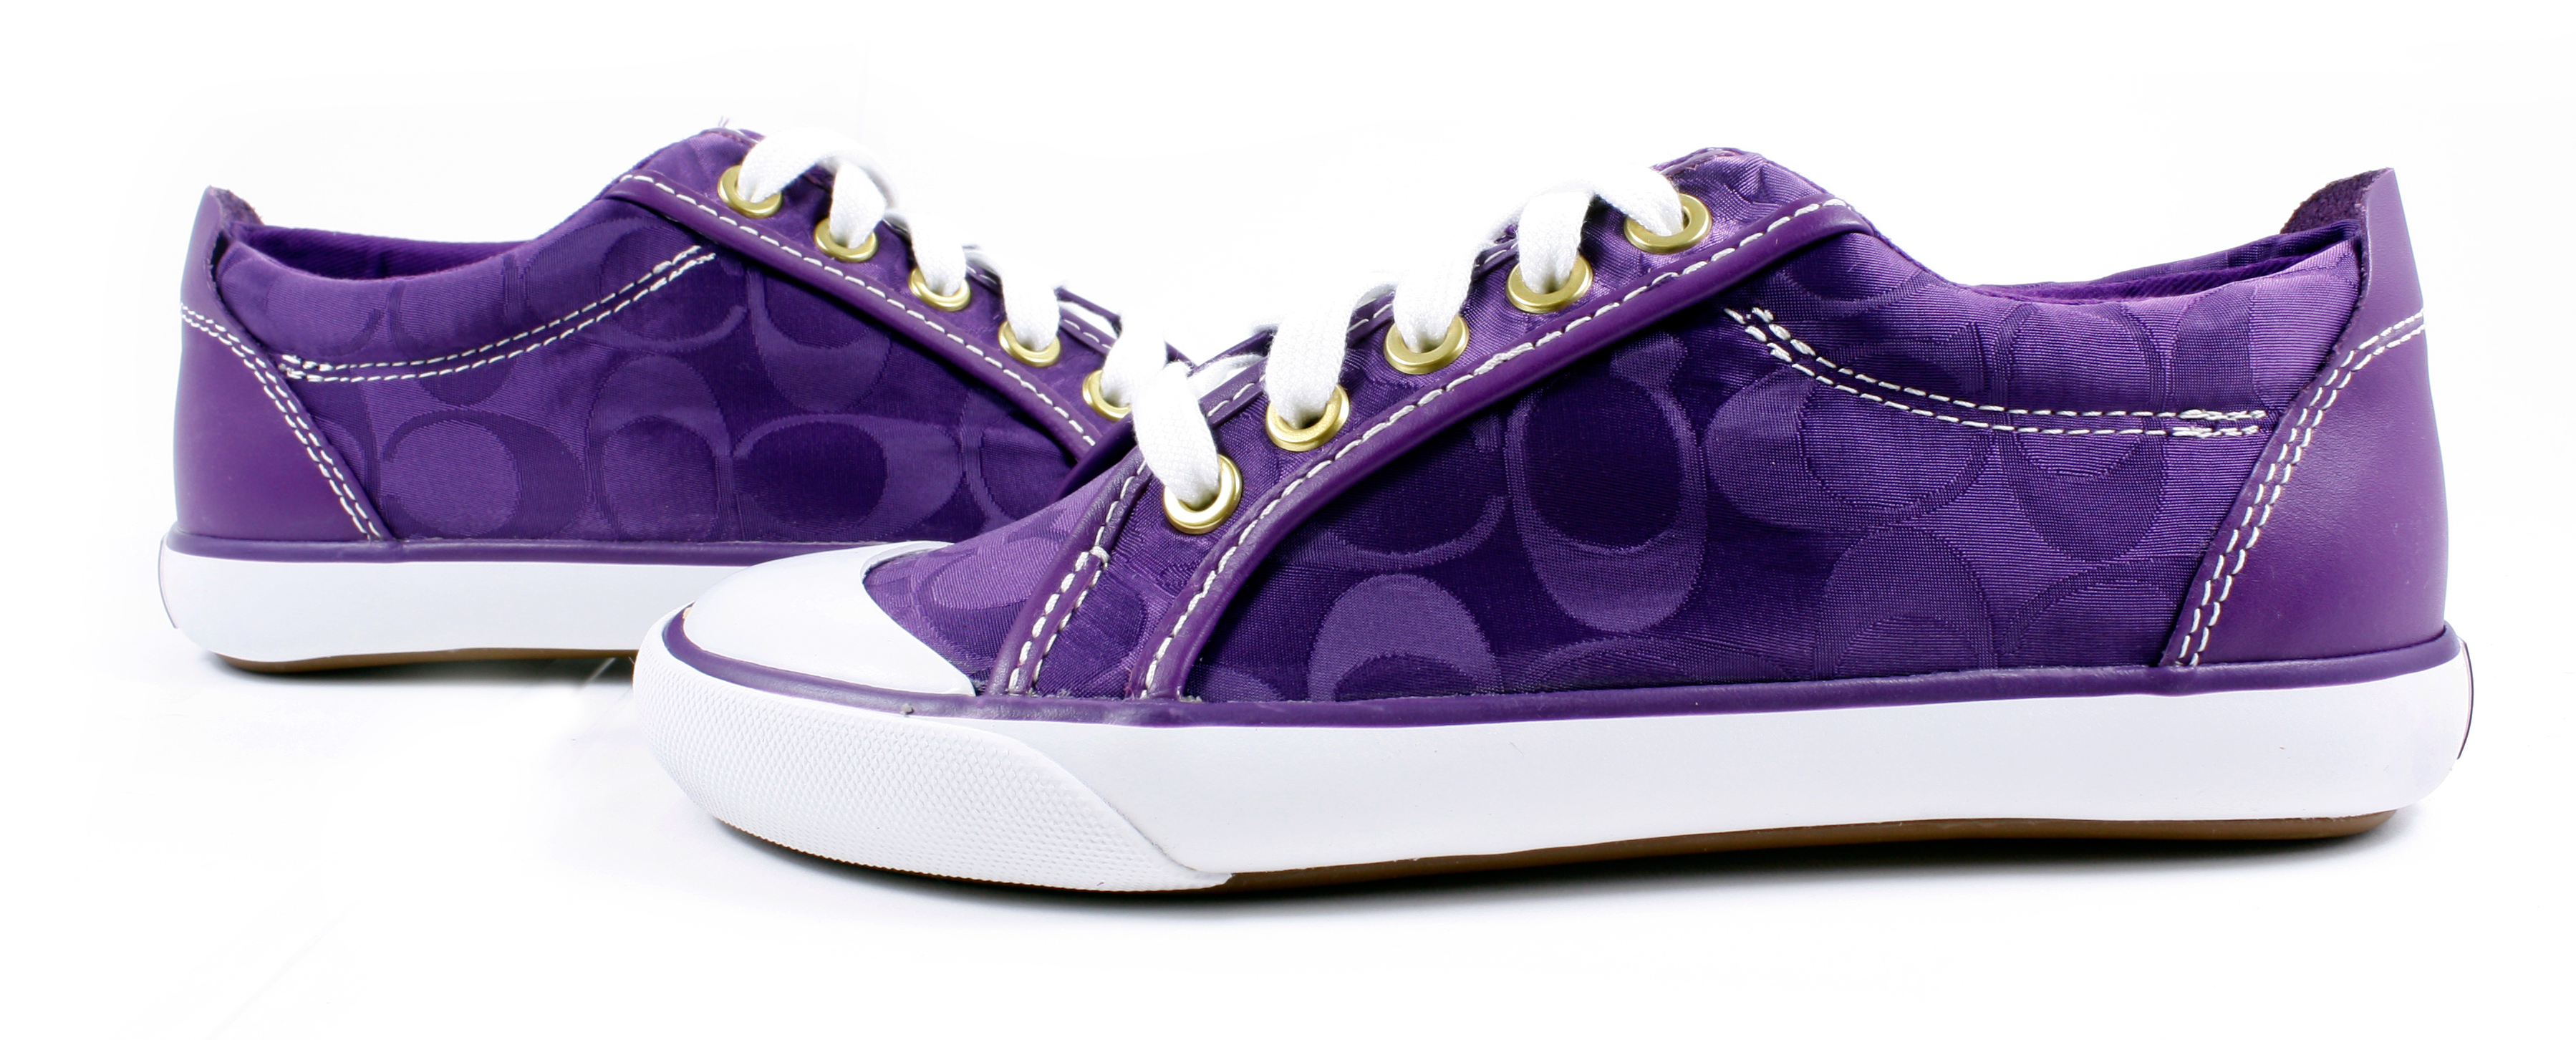 Barrett Coach Shoes On Sale